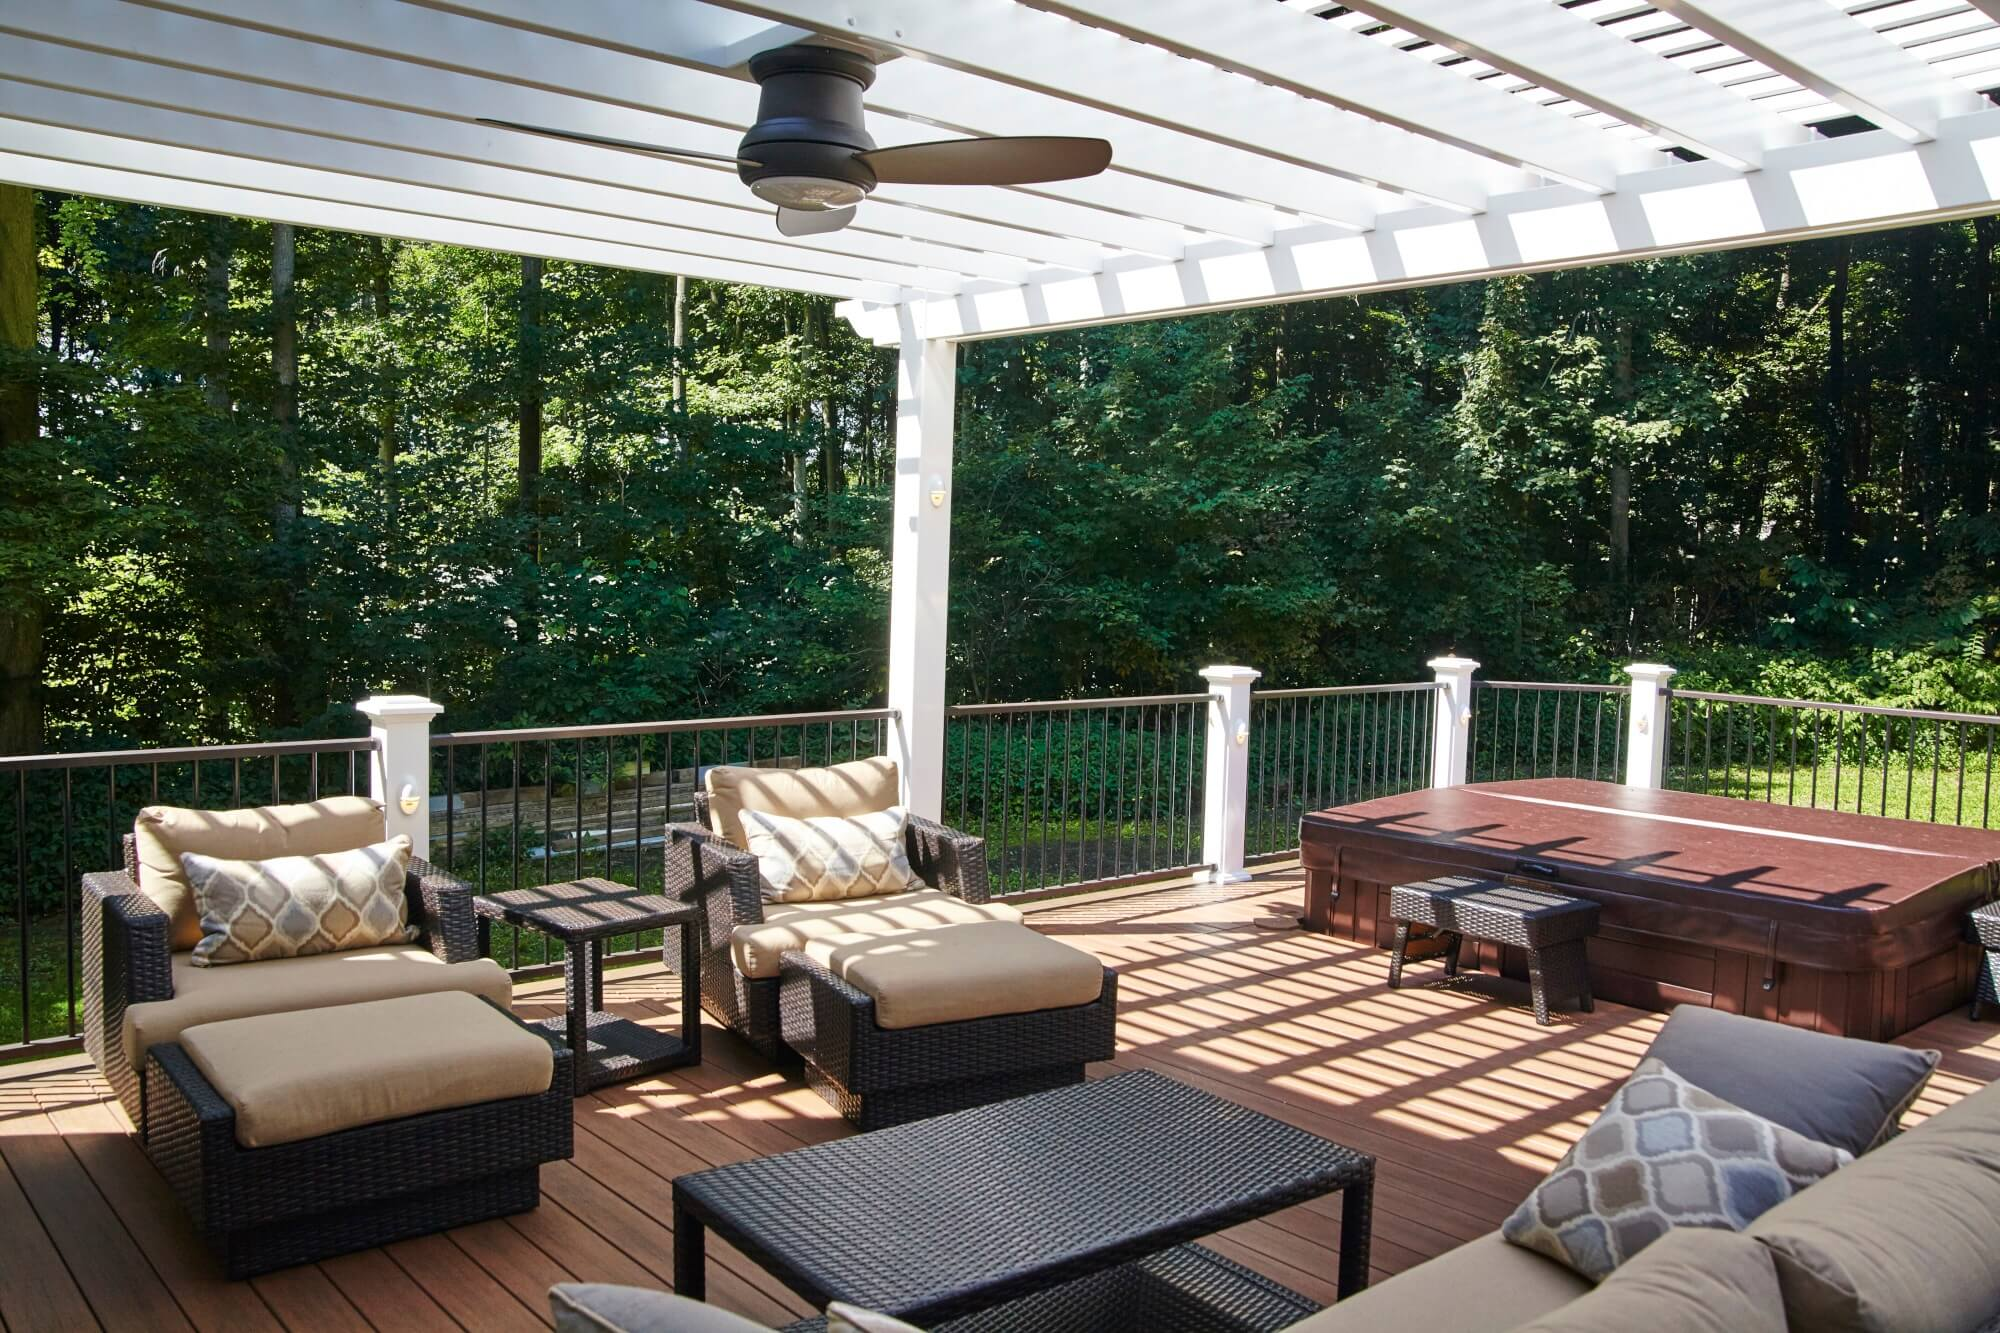 Cozy custom deck with pergola